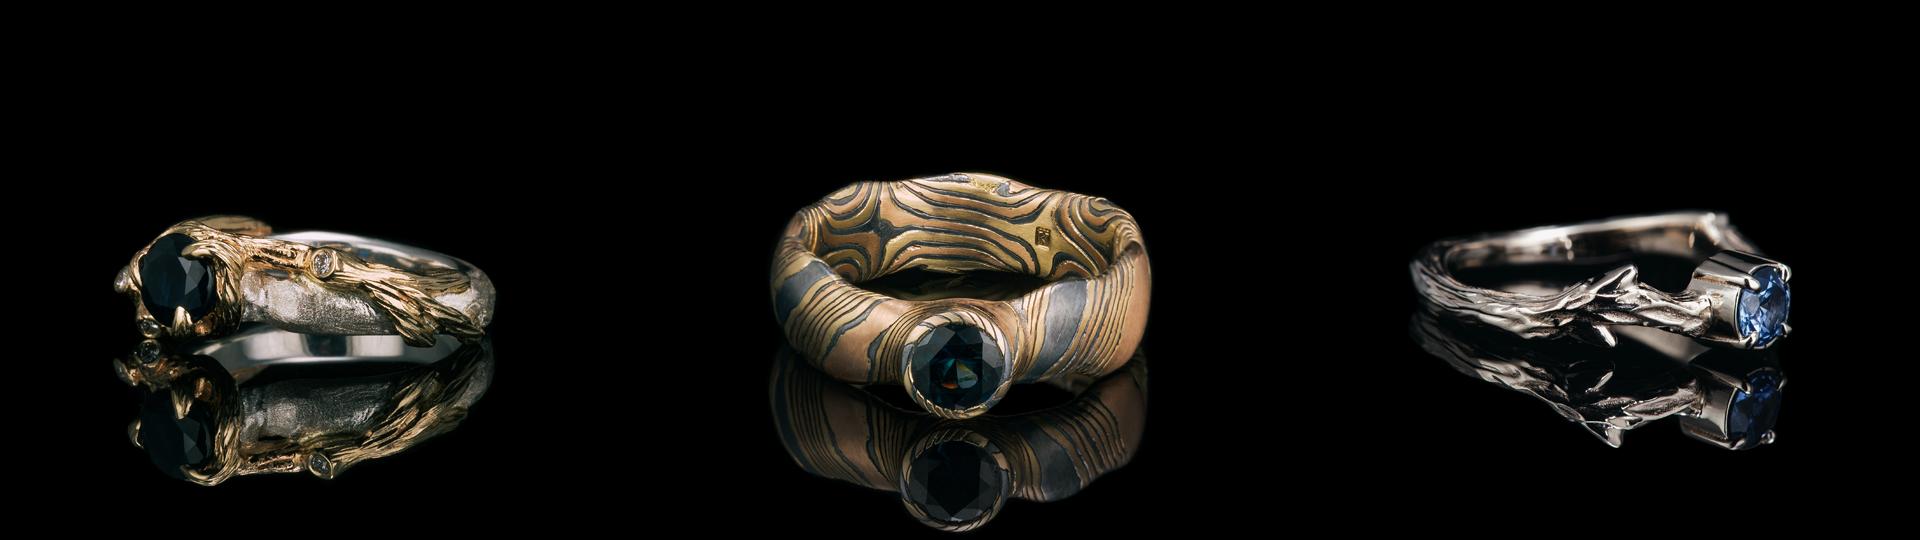 Kochut Jewelry Наш орієнтир